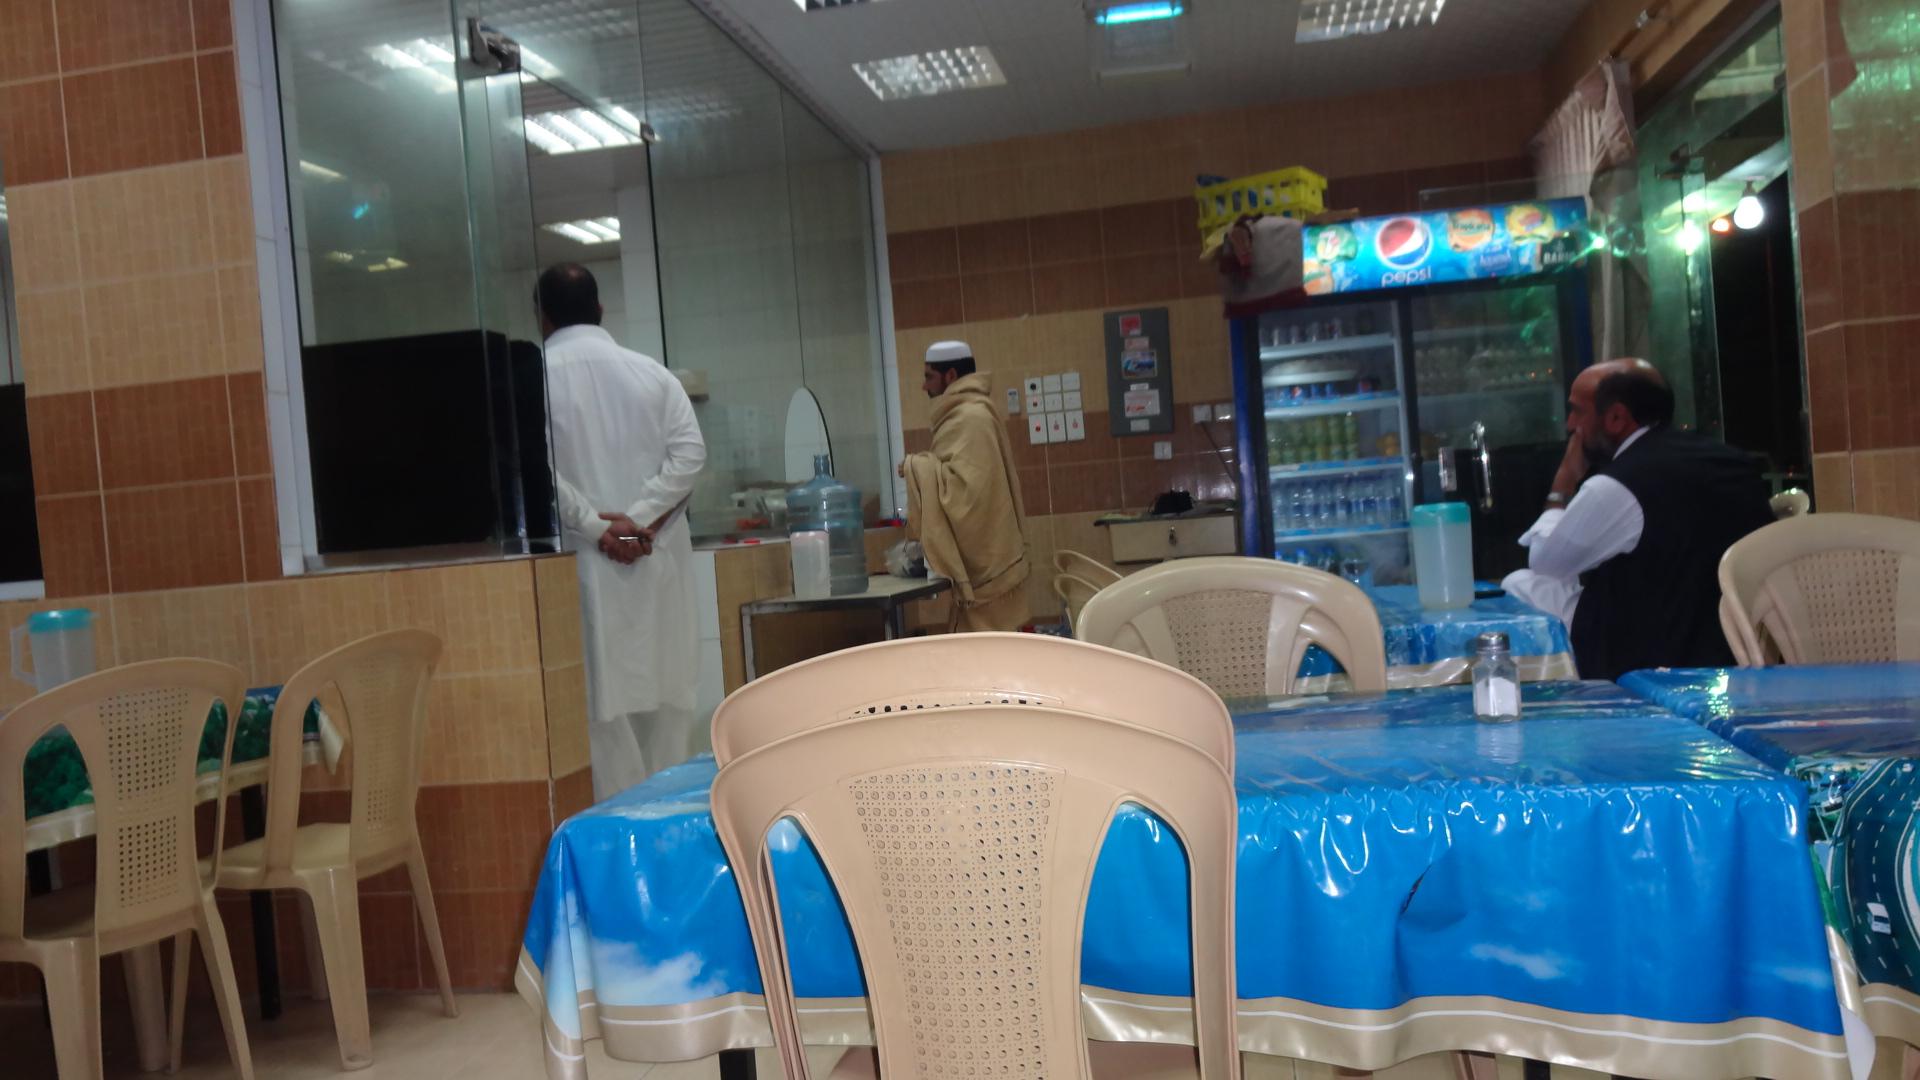 Inside the Pakistani restaurant